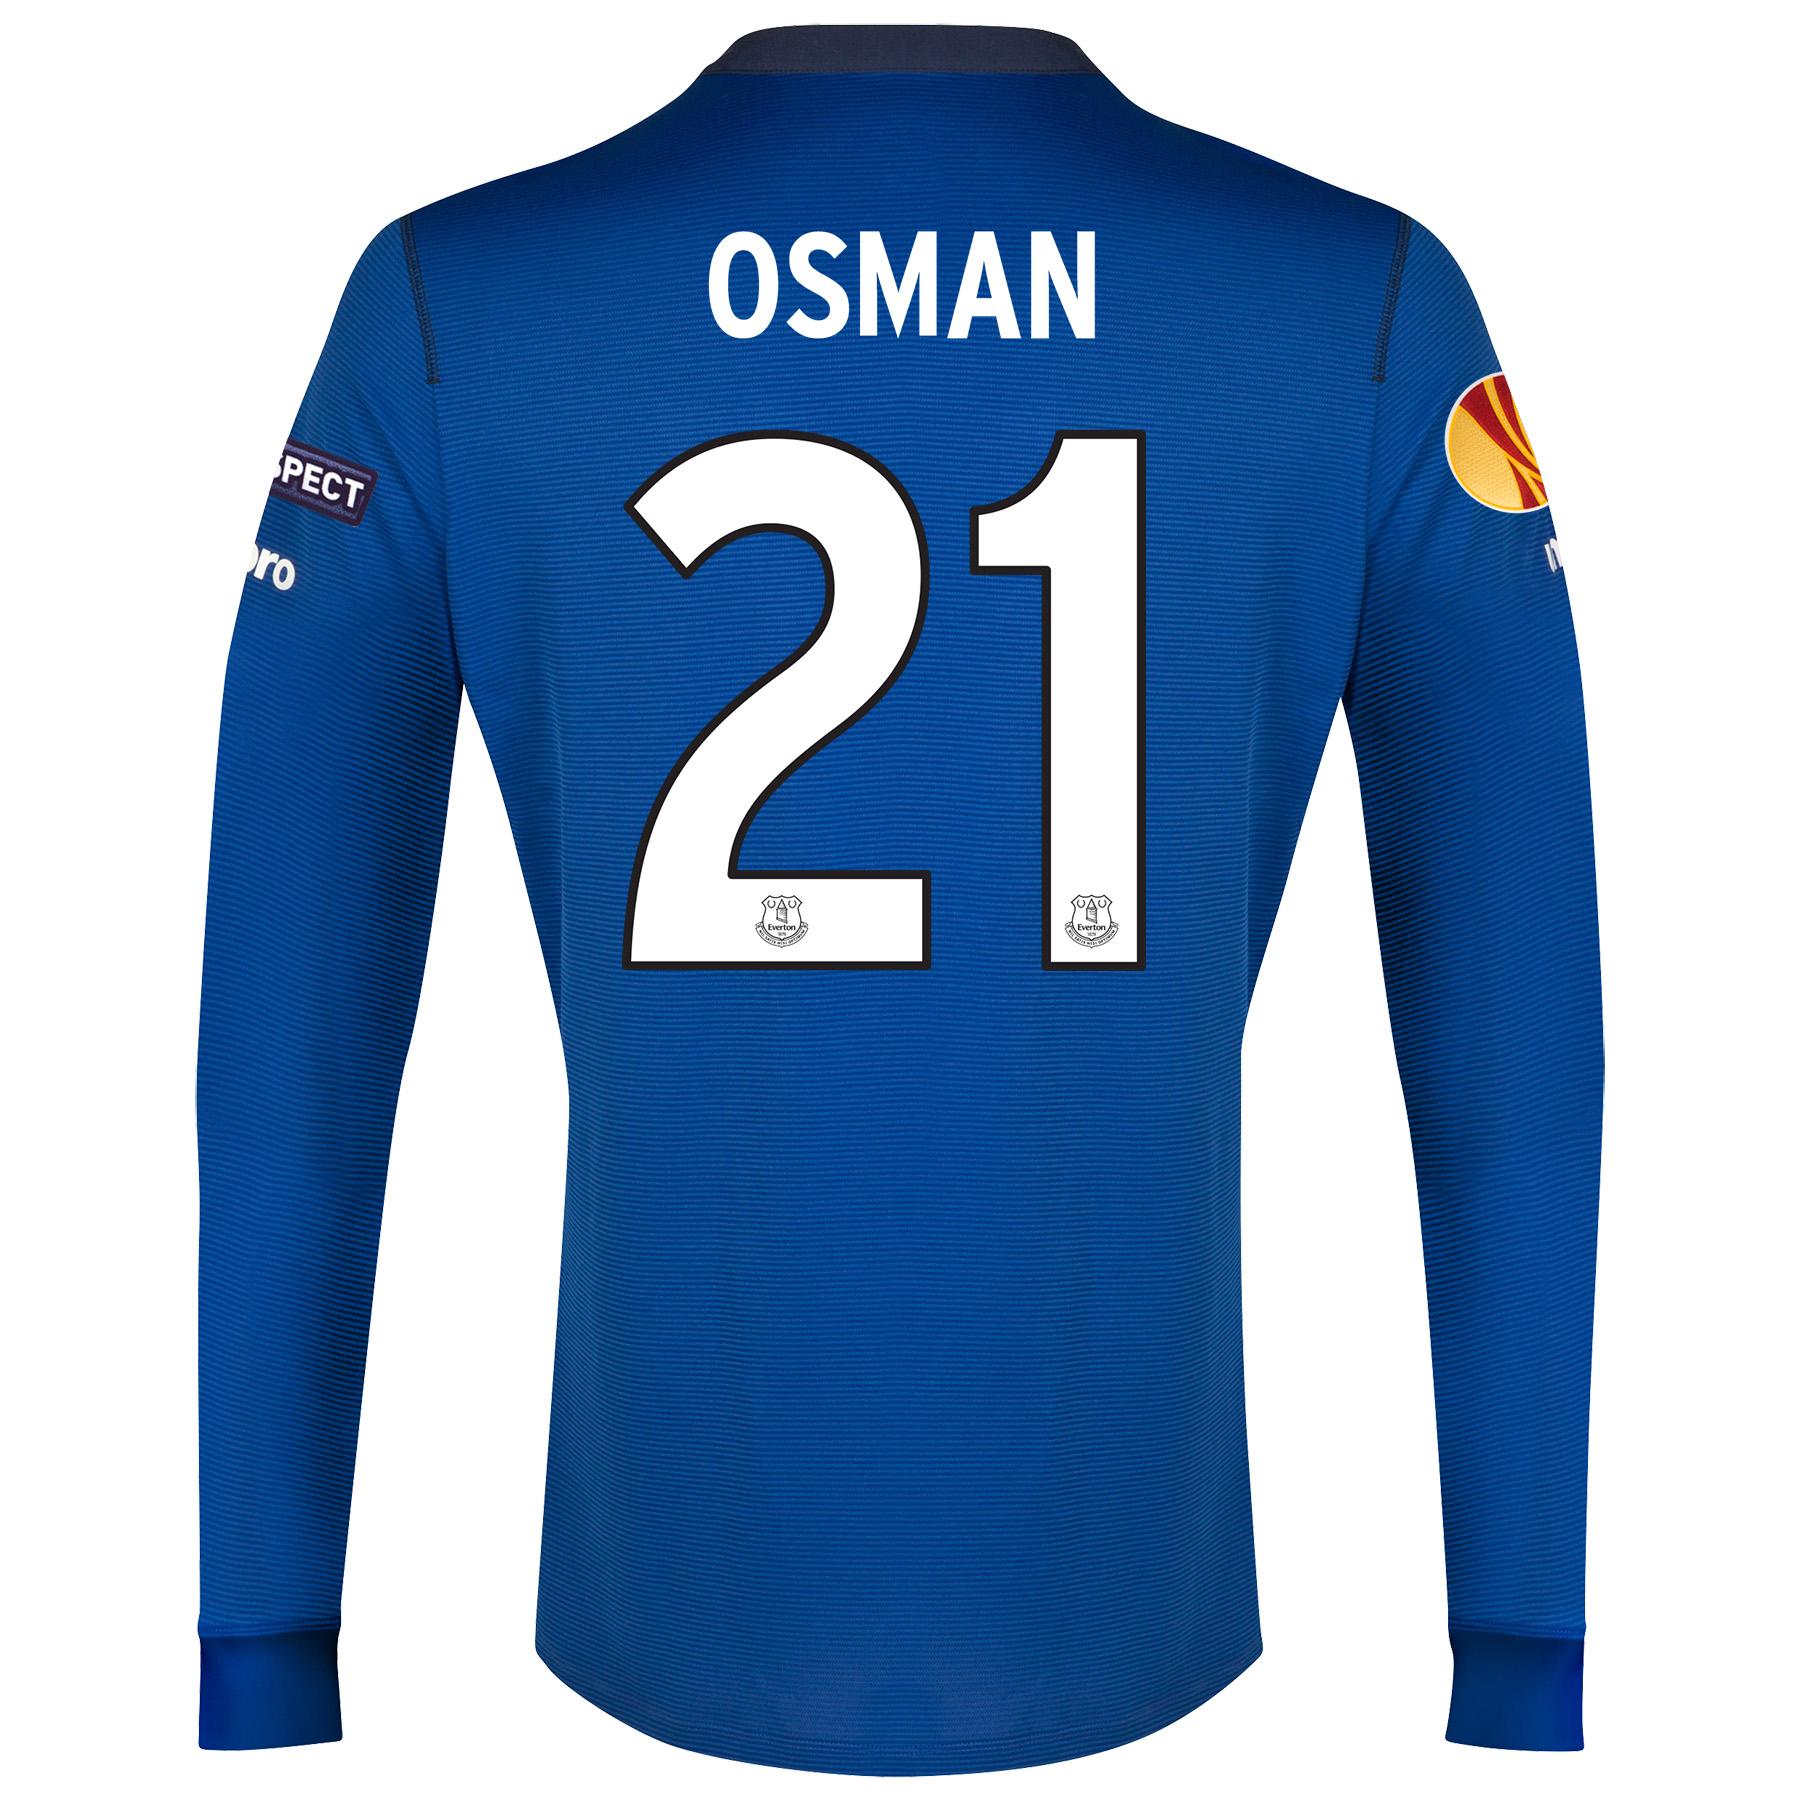 Everton UEFA Europa League Home Shirt 2014/15 LS with Osman 21 printing